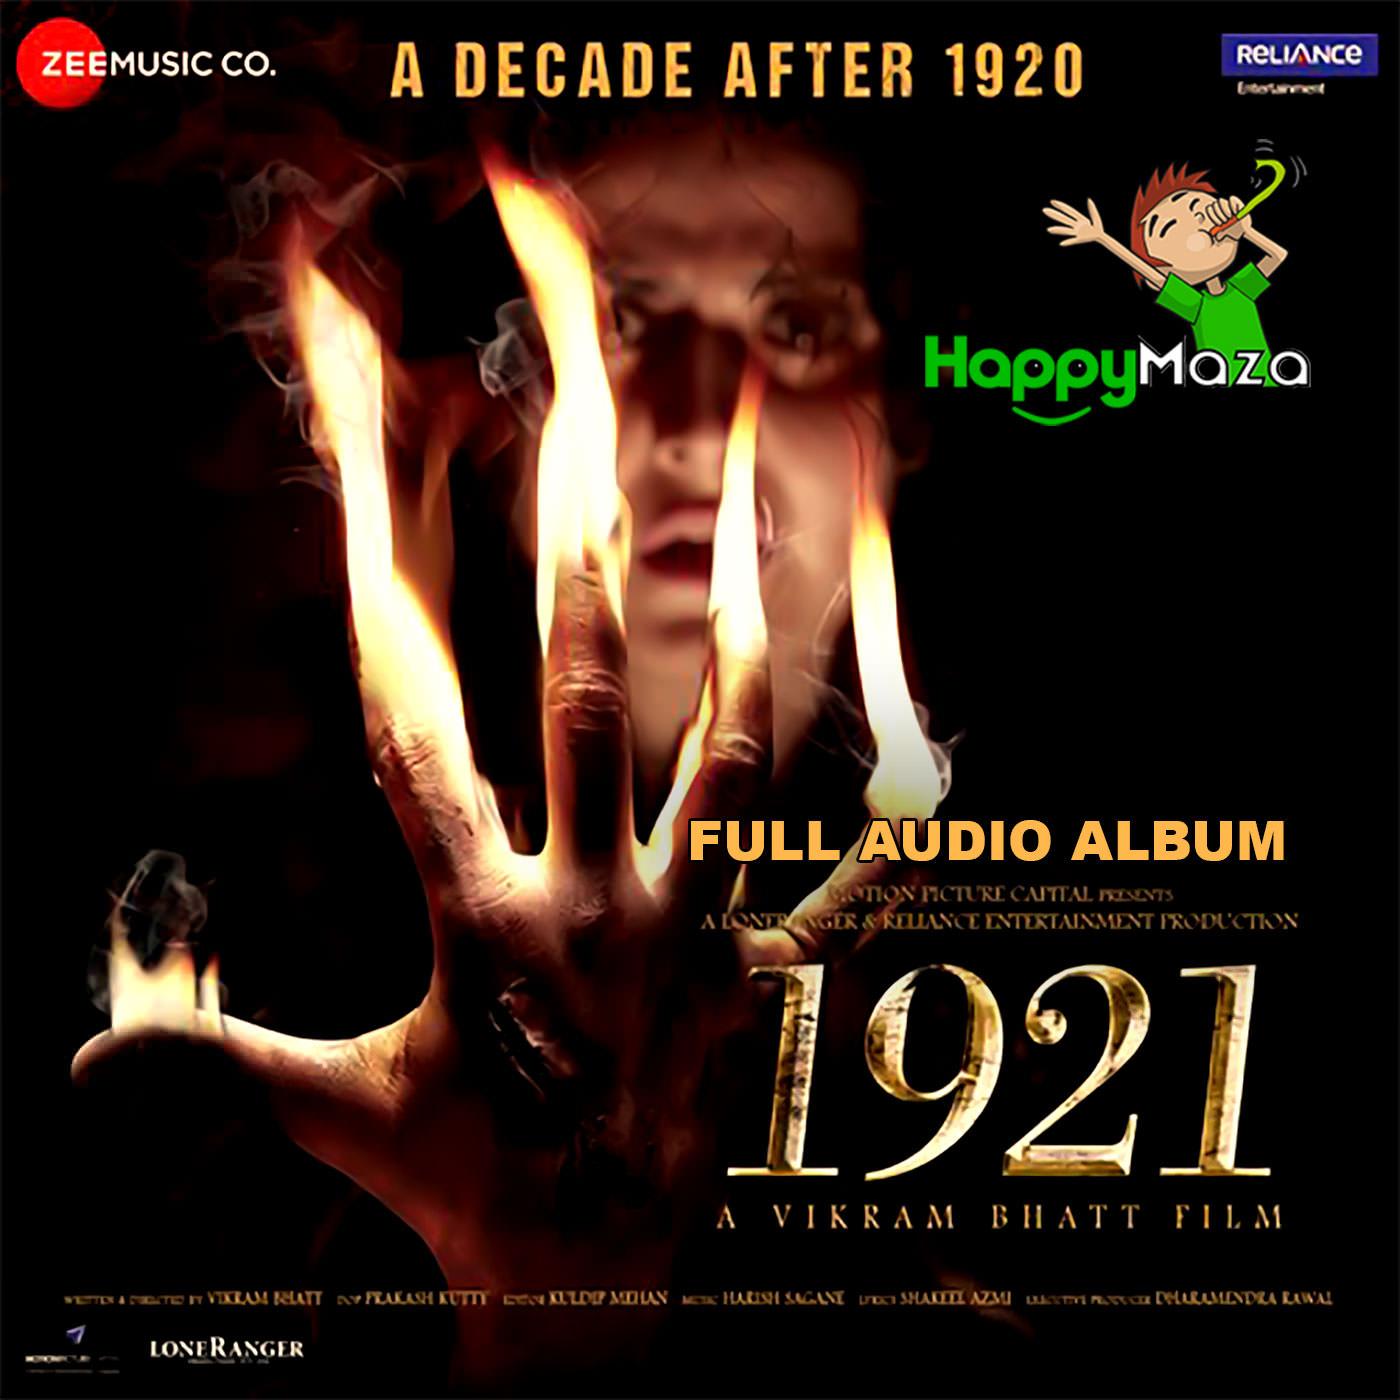 Koi Puche Mere Dil Full Mp3 Song Download: 1921 Lyrics - Full Song - 2017